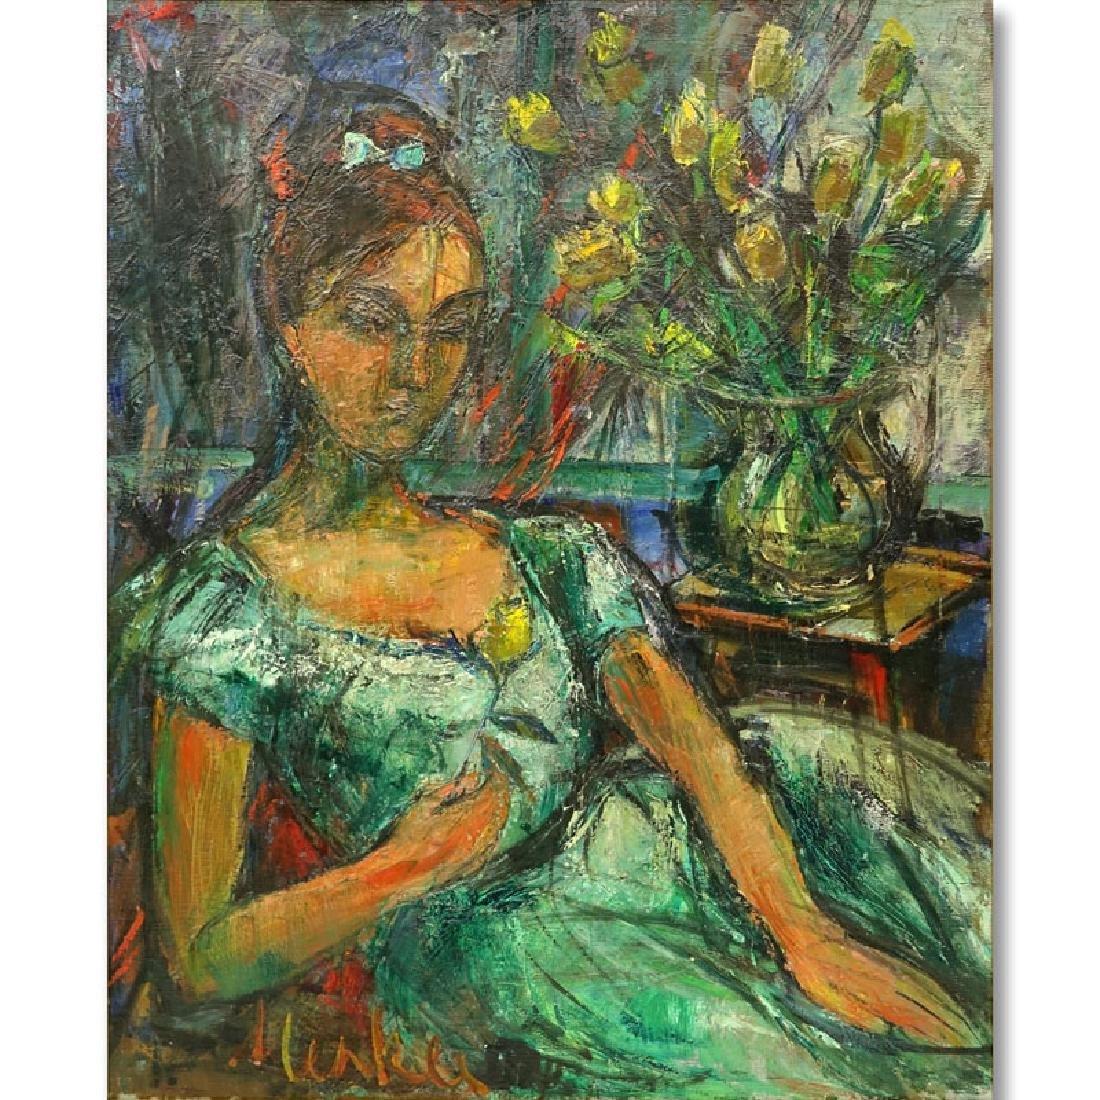 Attributed to: Sigmund Menkes, Polish (1896 - 1986) Oil - 6